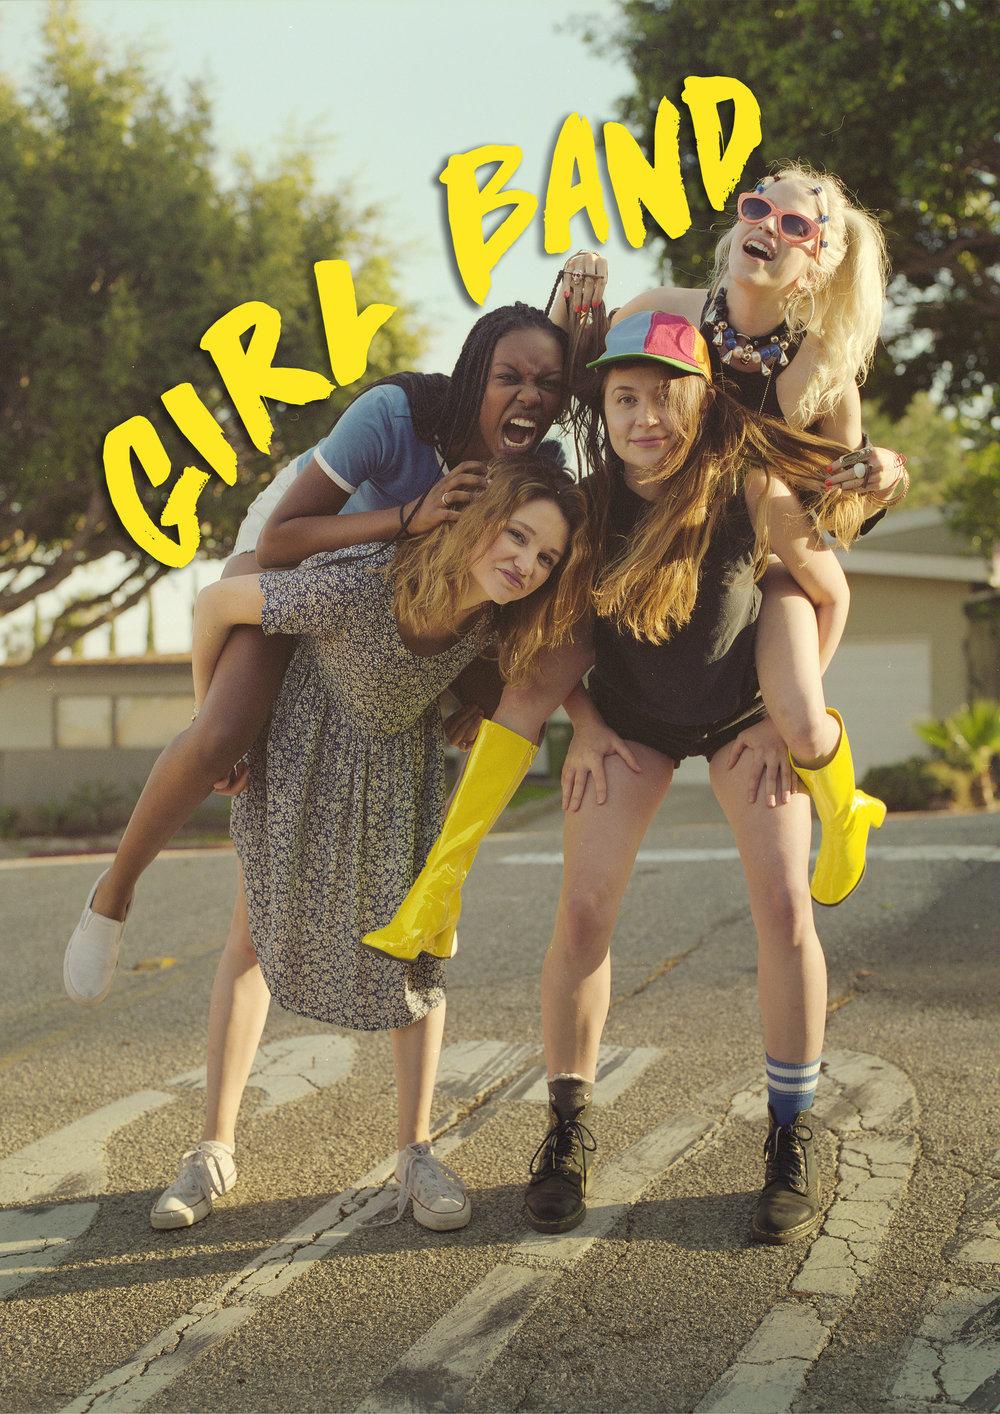 GIRL+BAND+POSTER_NOCREDITS_(KERRY+FURRH).jpg